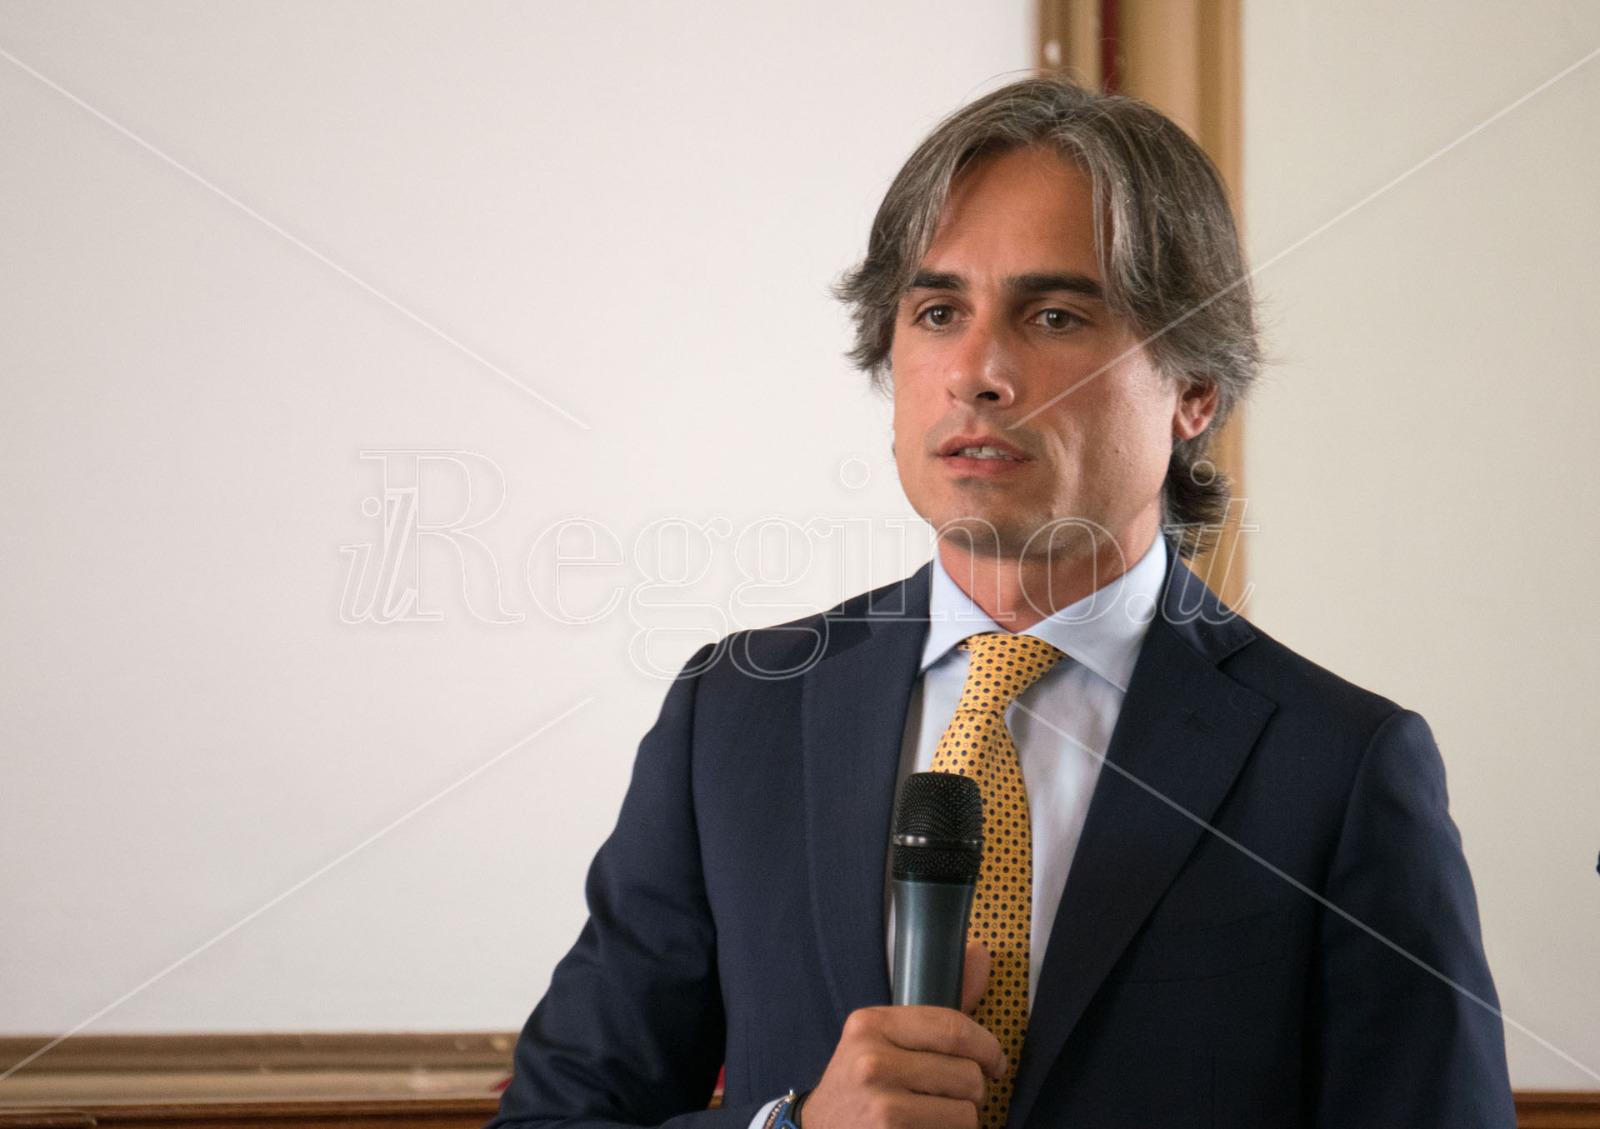 Coronavirus a Reggio Calabria, Falcomatà: «Valutiamo chiusura notturna aree a rischio»